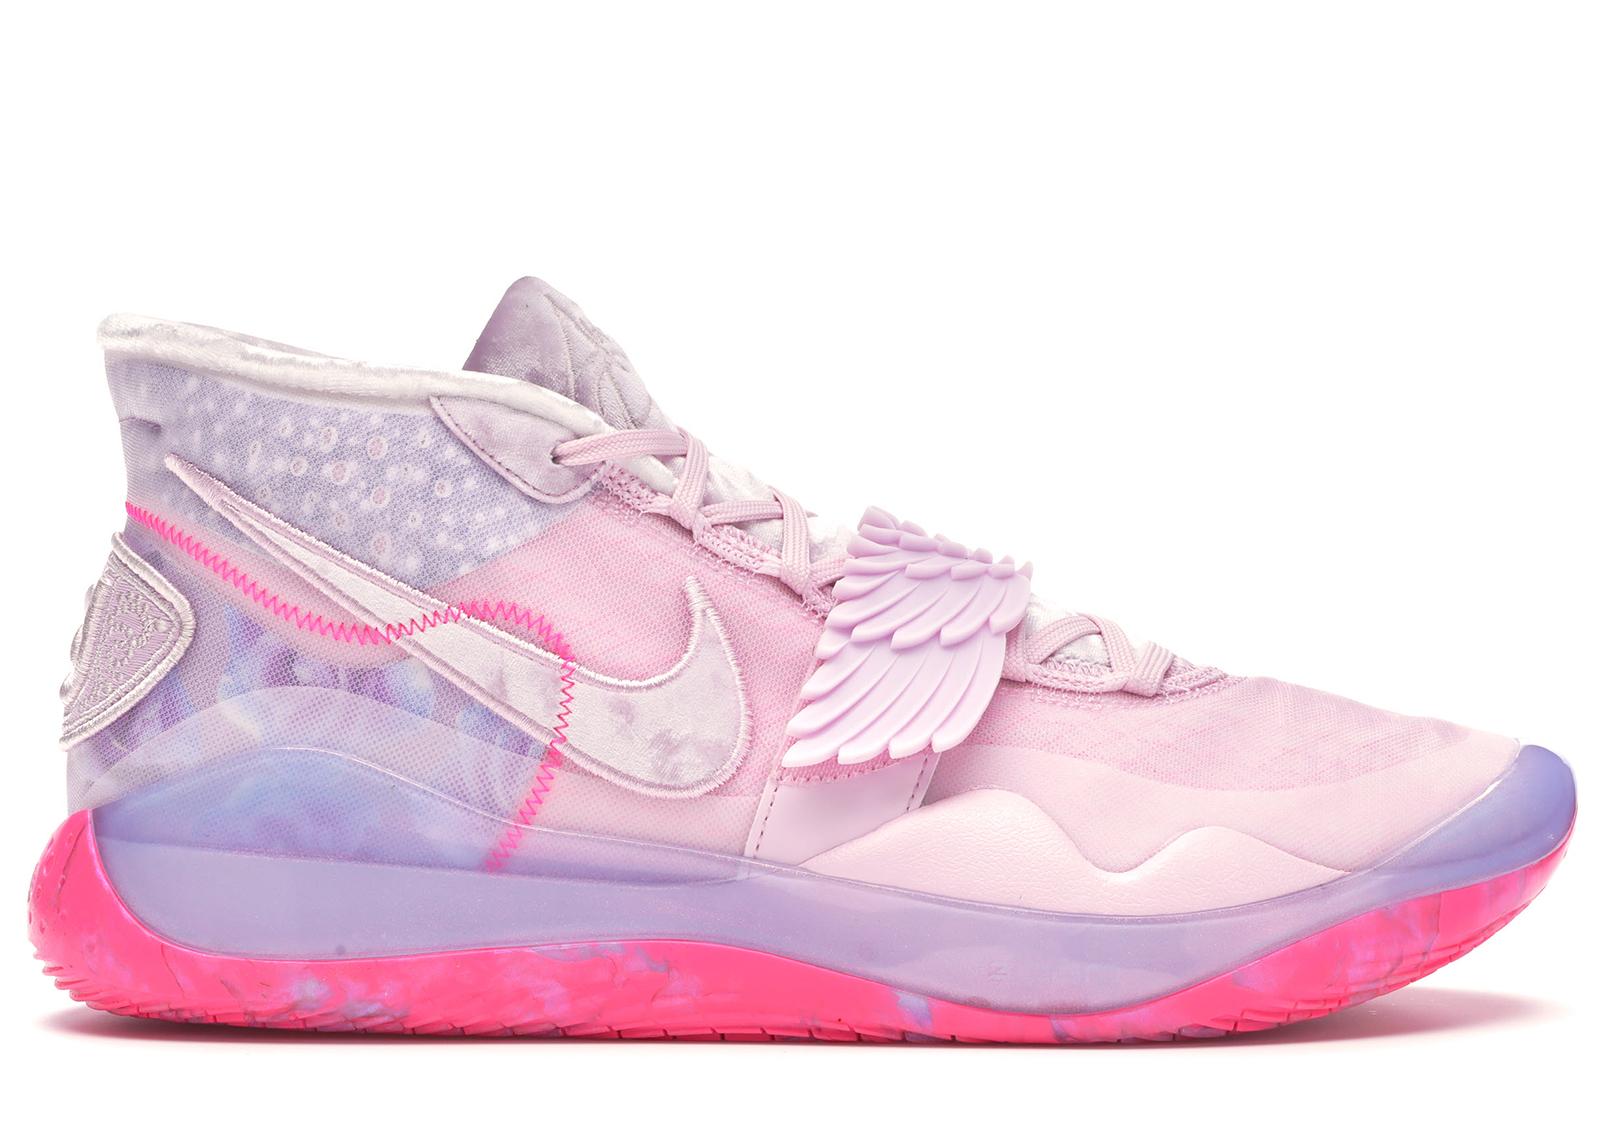 Nike KD 12 Aunt Pearl - CT2740-900